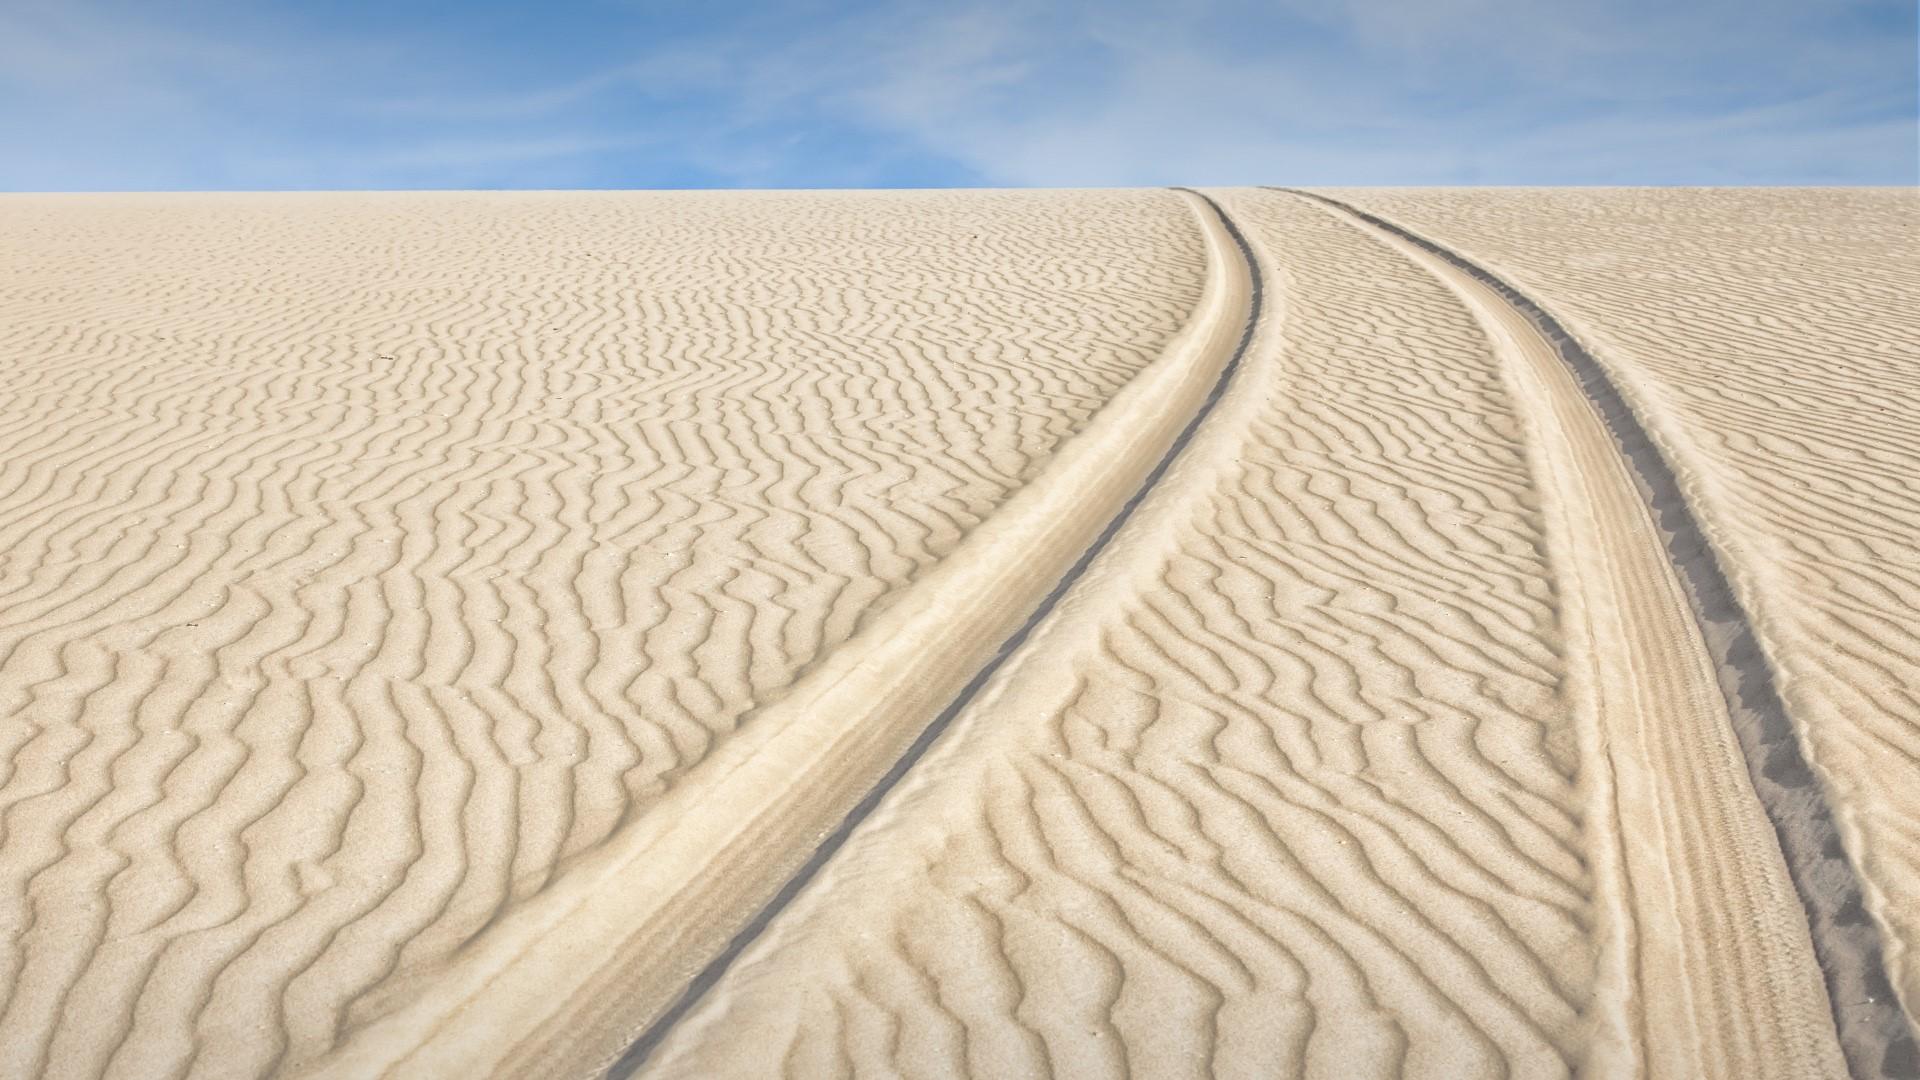 General 1920x1080 sand clouds sky Sand Ripples tire mark dunes Brazil Jericoacoara National Park nature landscape